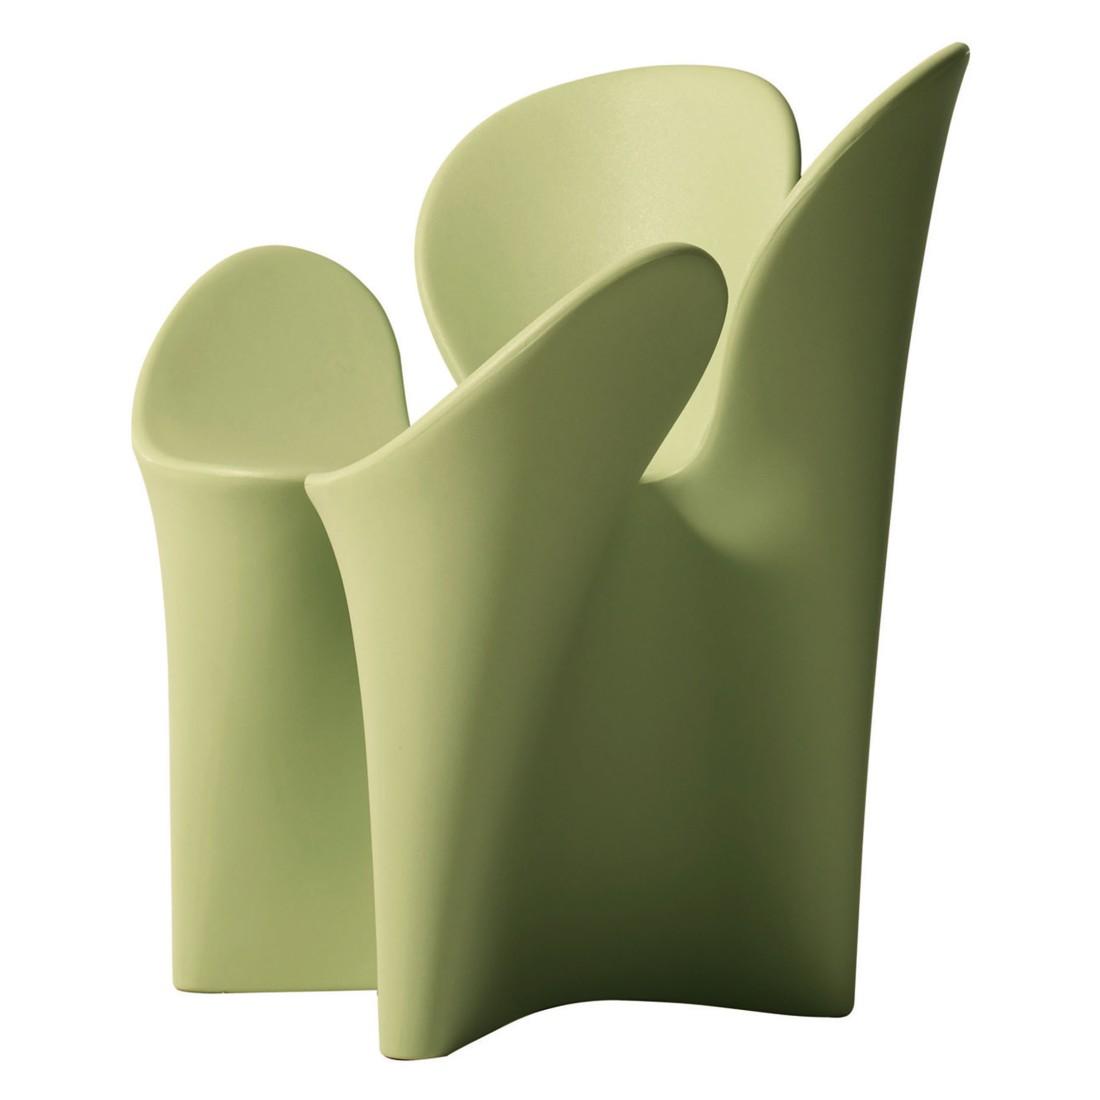 Armlehnenstuhl Clover - Polyethylen Grün, Driade